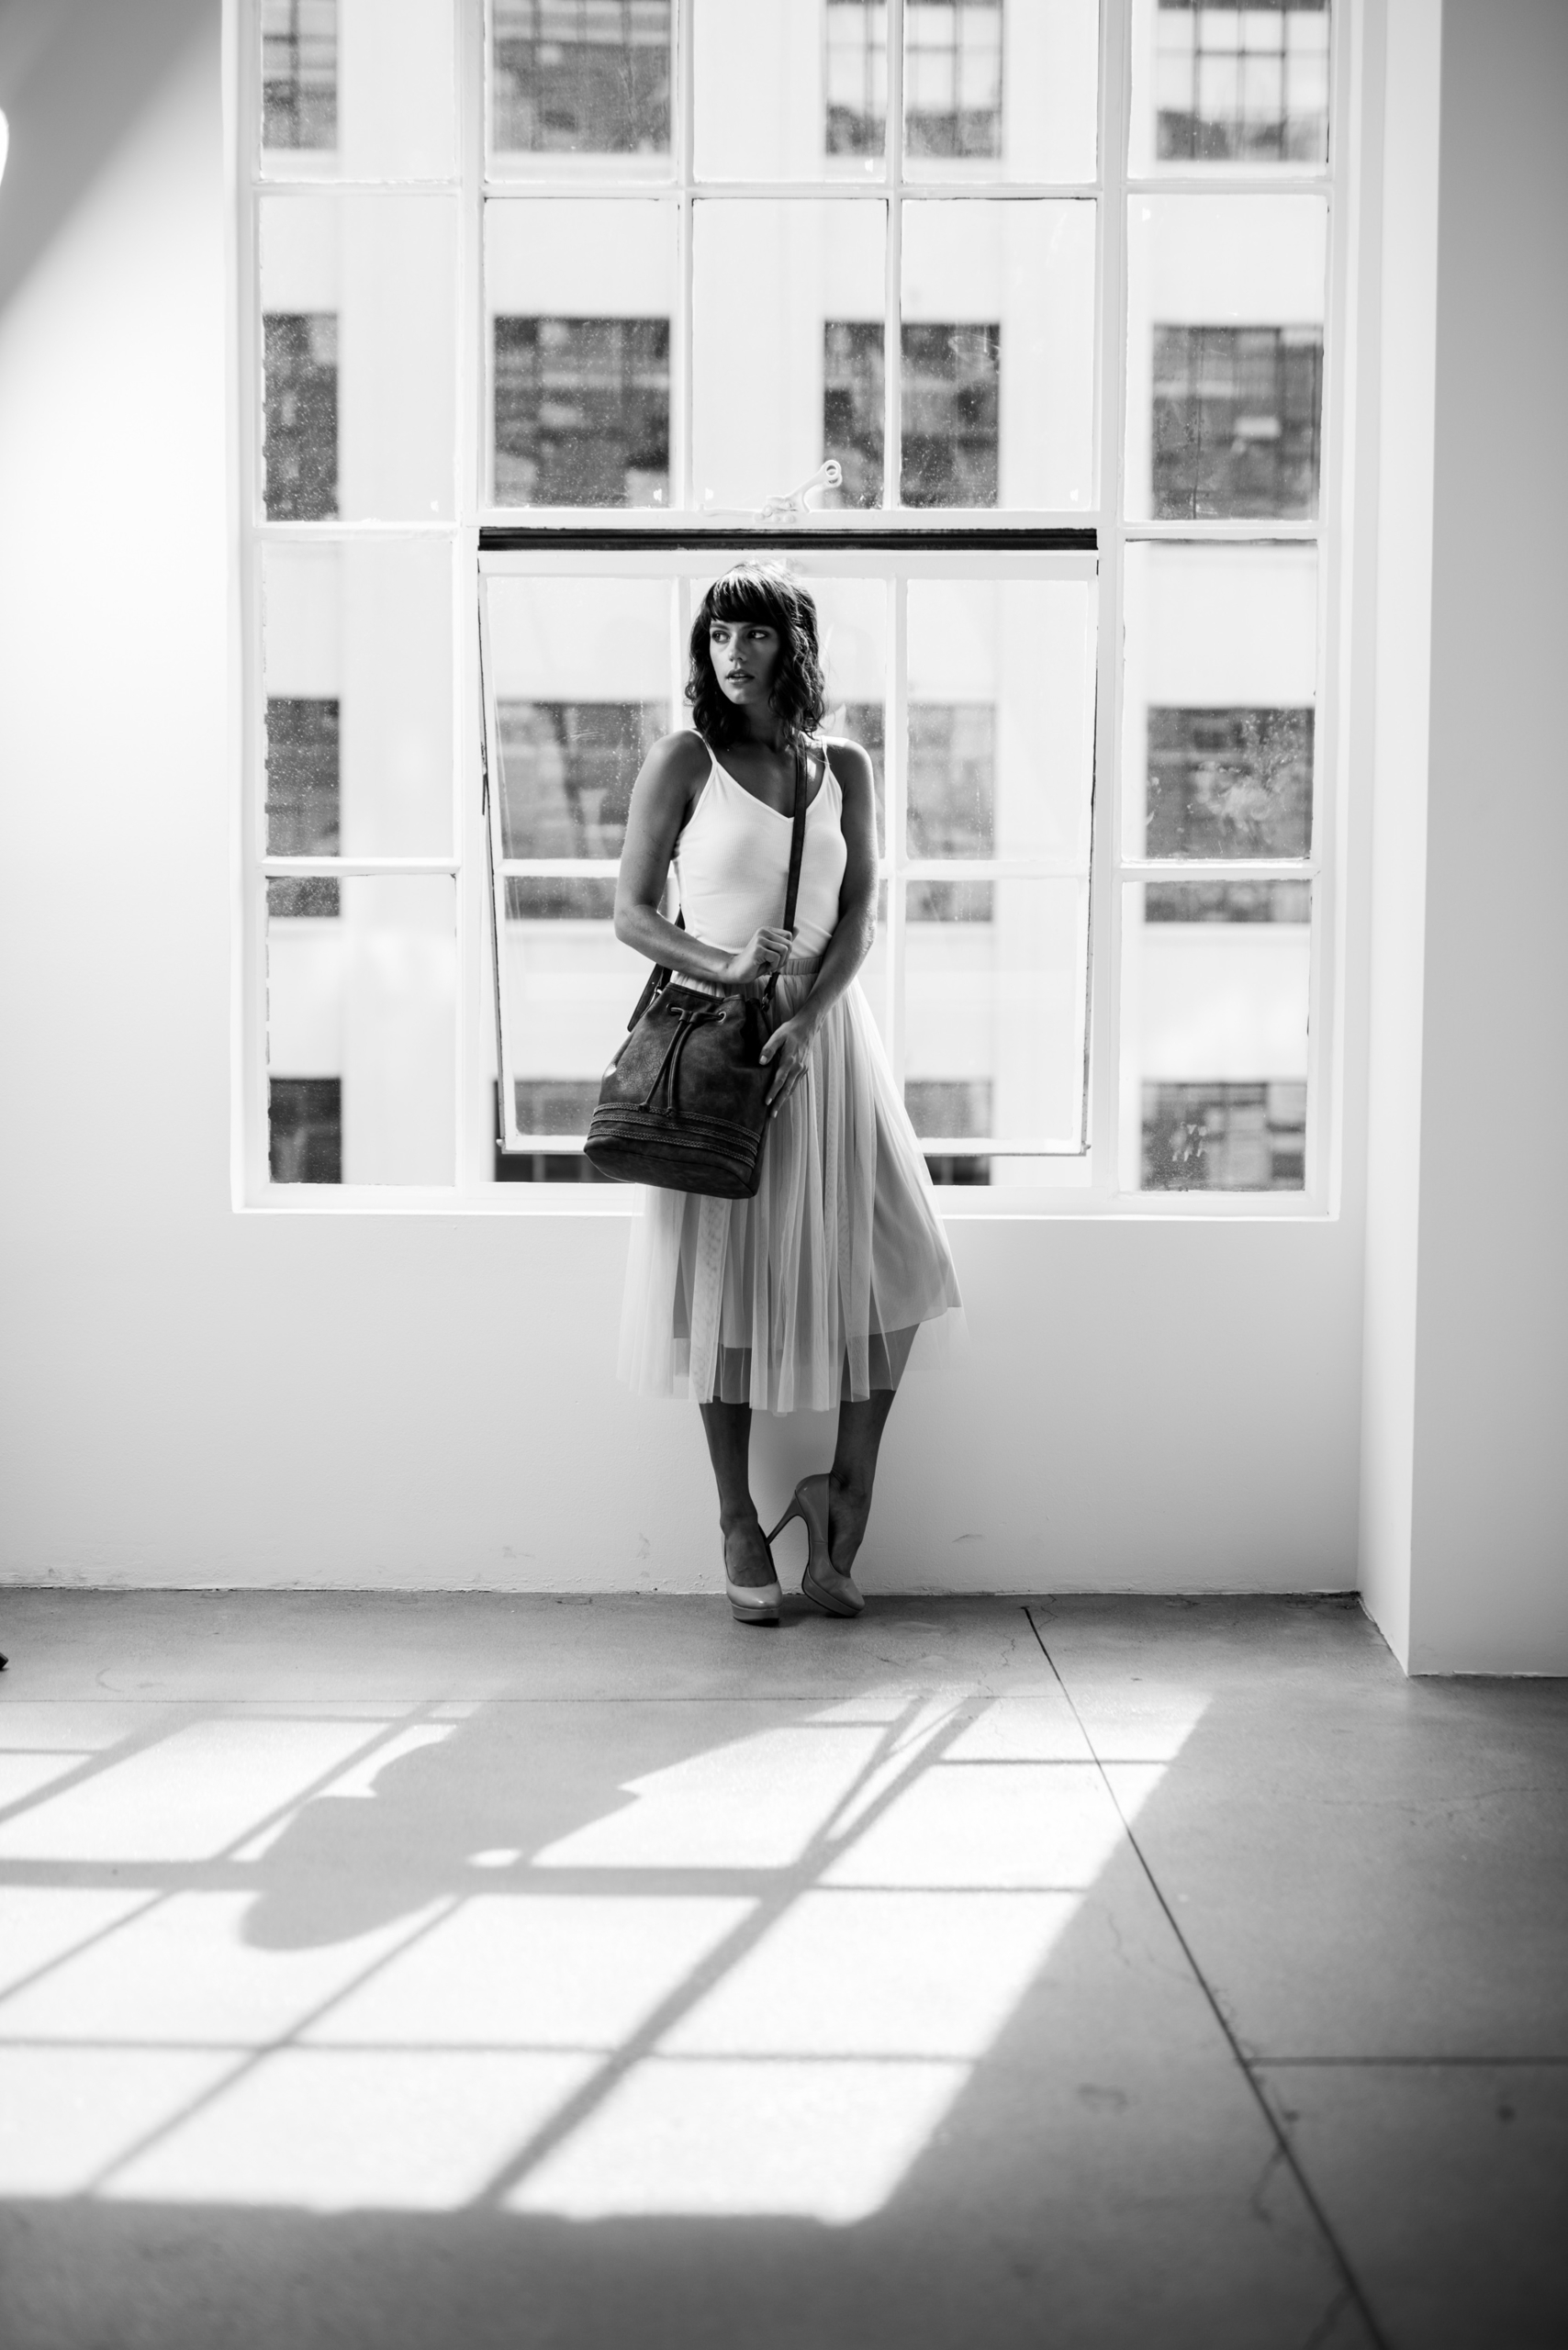 Fashion Hayden Harnett Heidi - ben-staley | ello